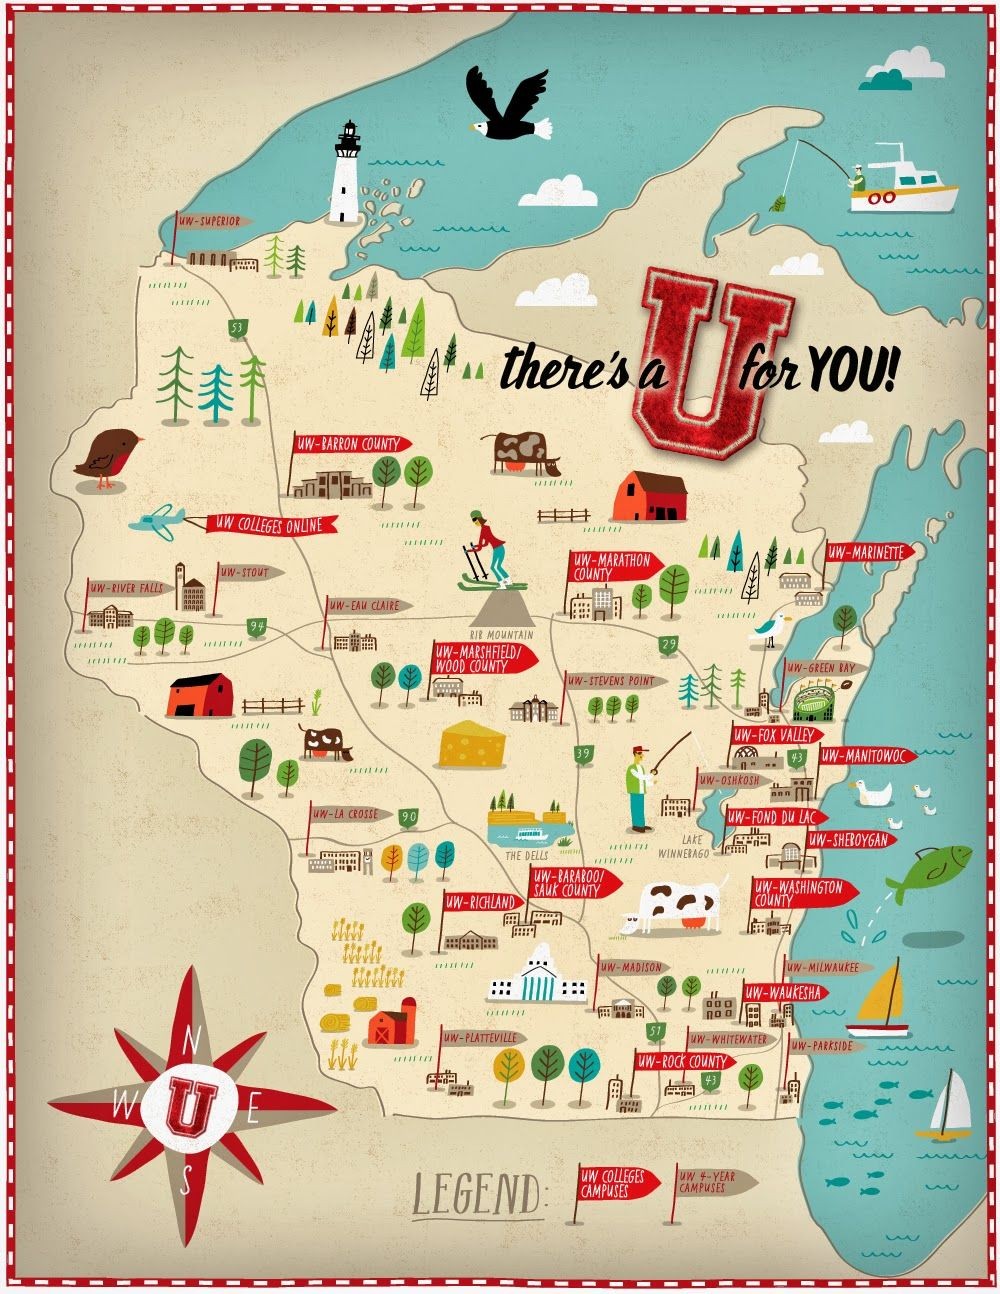 Oshkosh Campus Map.Campus Locator Map For University Of Wisconsin Map Illustration